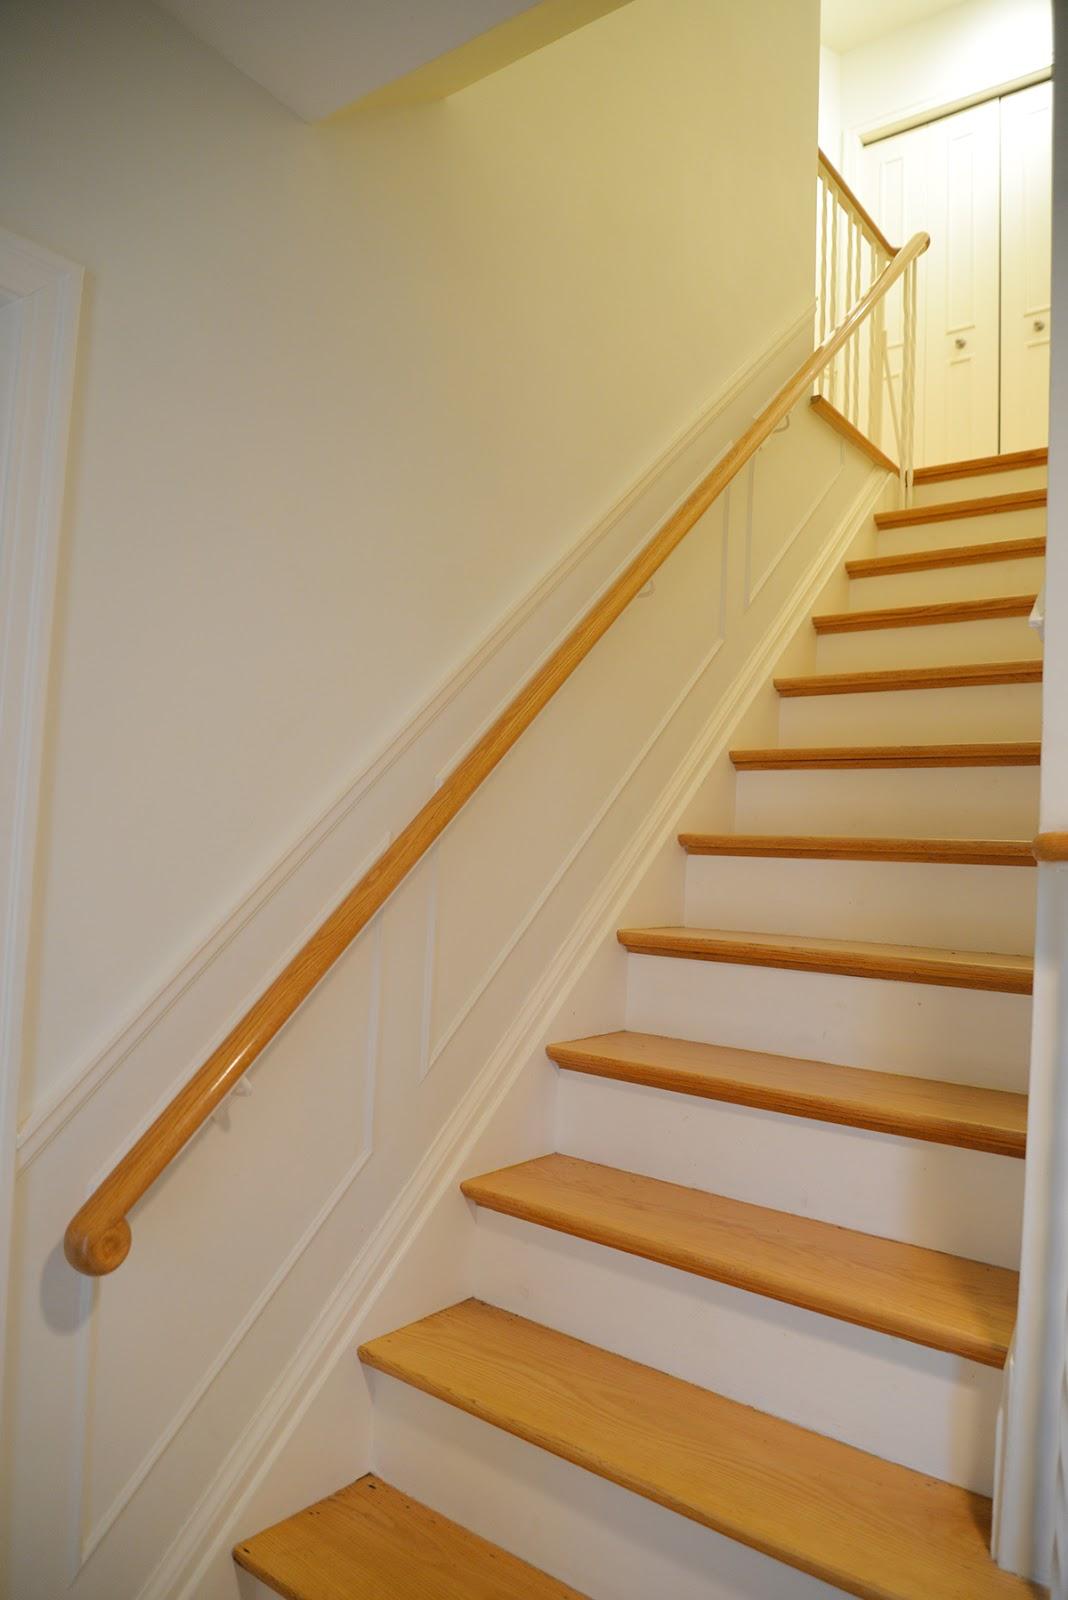 Entryway Refresh Stair Railing Update Rambling Renovators | Iron Handrails For Stairs Interior | Wall Mounted | Balcony | Dark Brown | Room Divider | Custom